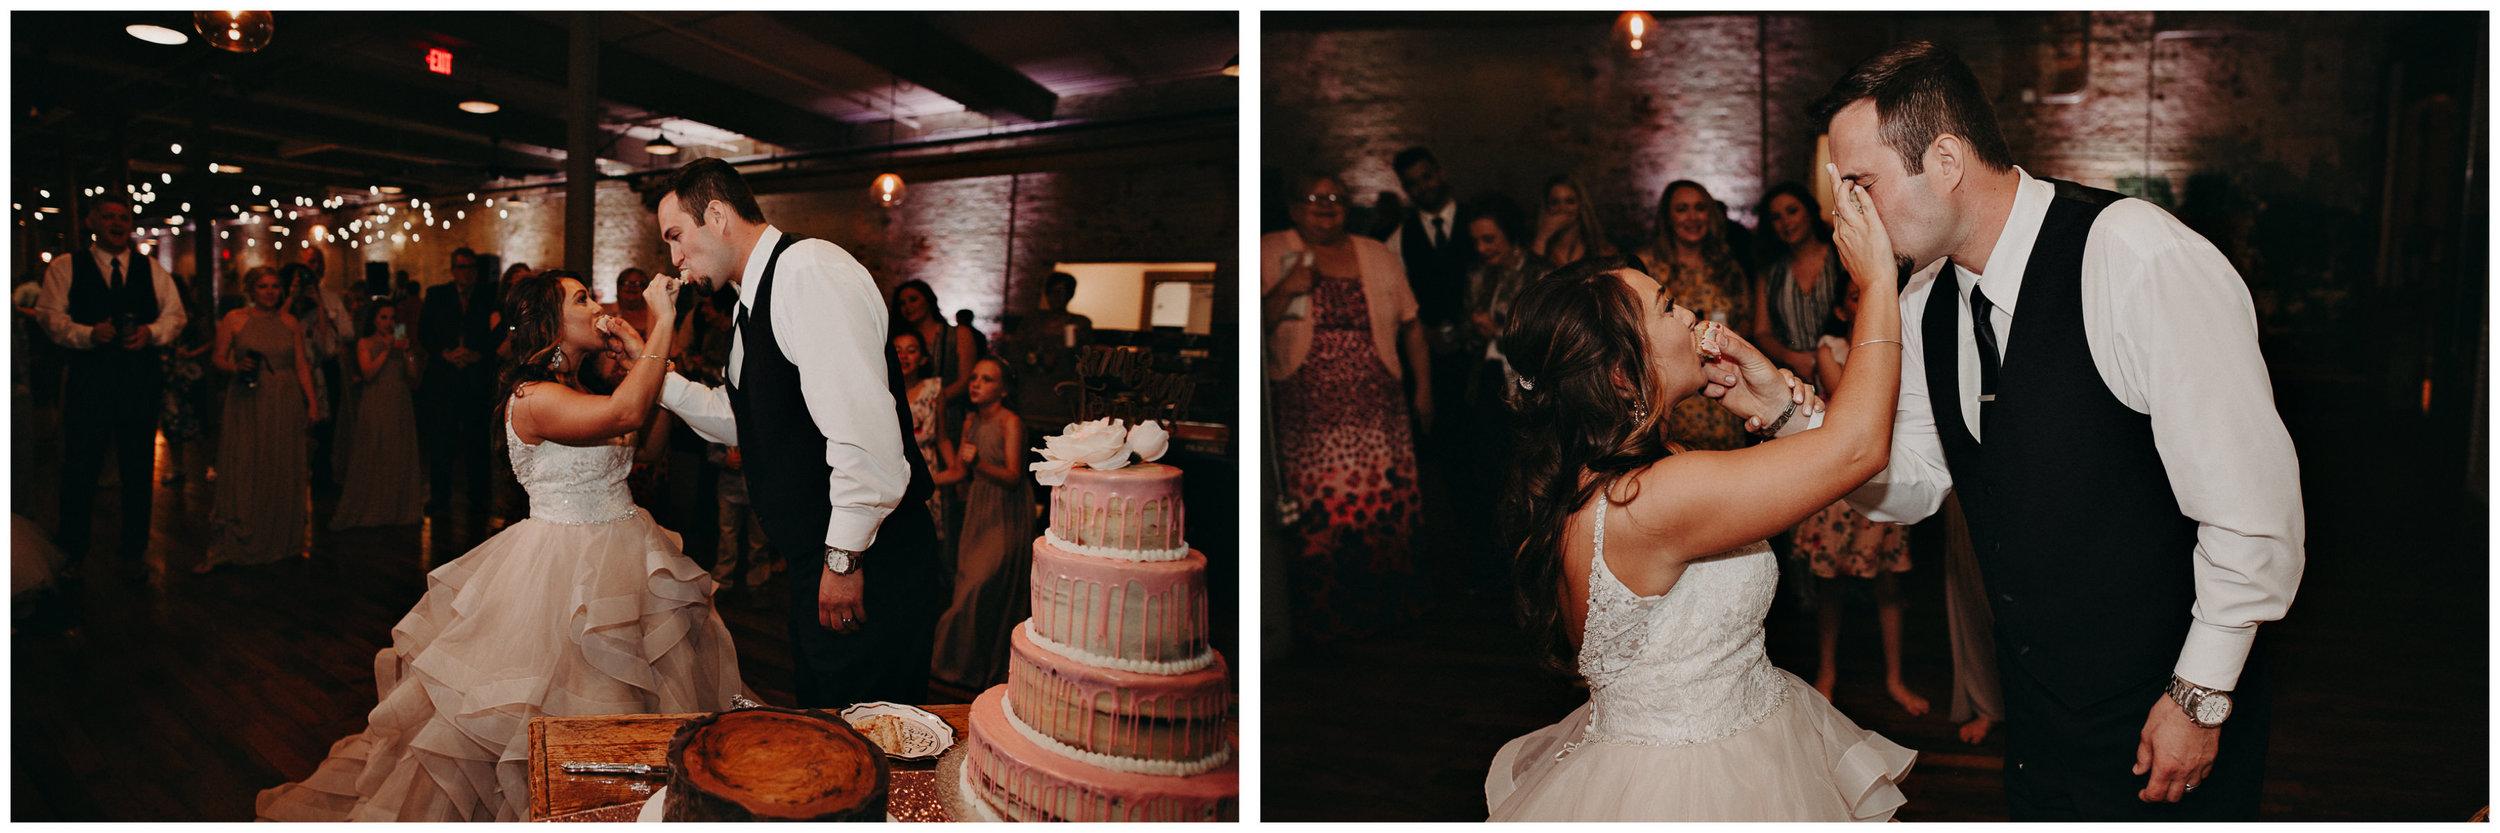 65 - Atlanta Wedding Photographer - The engine room - Ga - Wedding trends - Aline Marin Photography.jpg